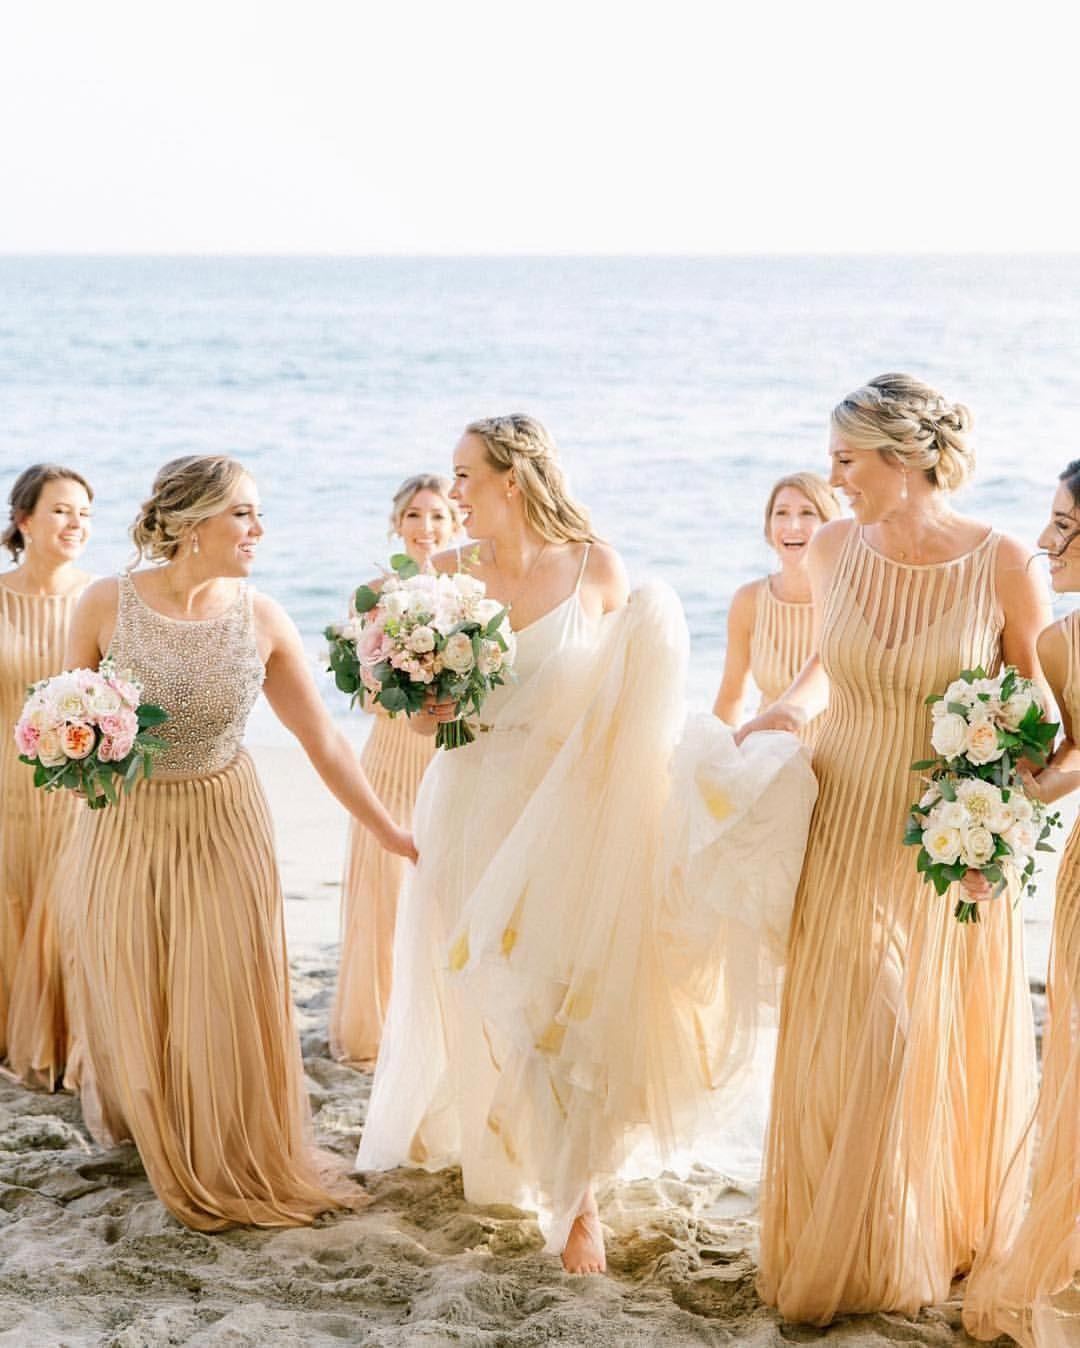 Gold Wedding Dress Gold Bridal Party Gold Bridesmaids Beach